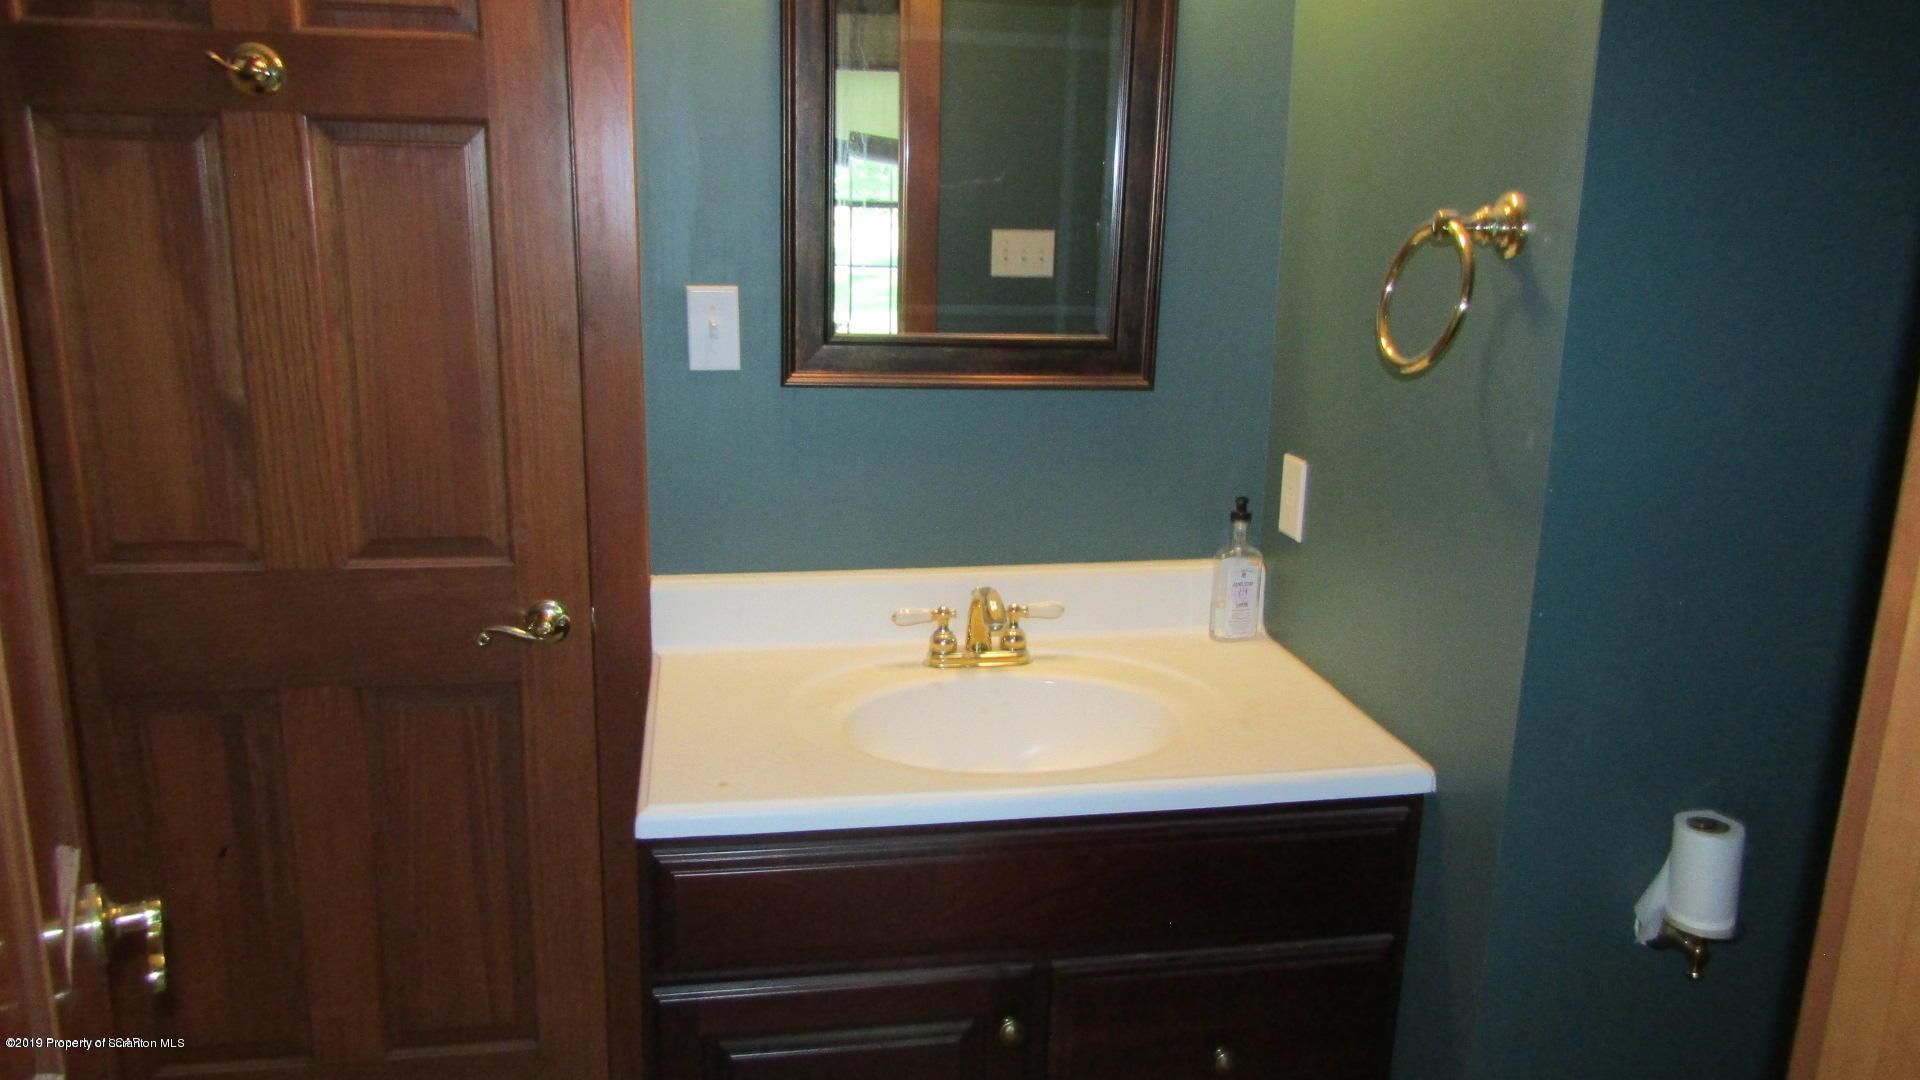 1281 Sandspring Rd, Bear Creek, Pennsylvania 18702, 5 Bedrooms Bedrooms, 12 Rooms Rooms,5 BathroomsBathrooms,Single Family,For Sale,Sandspring,19-4697